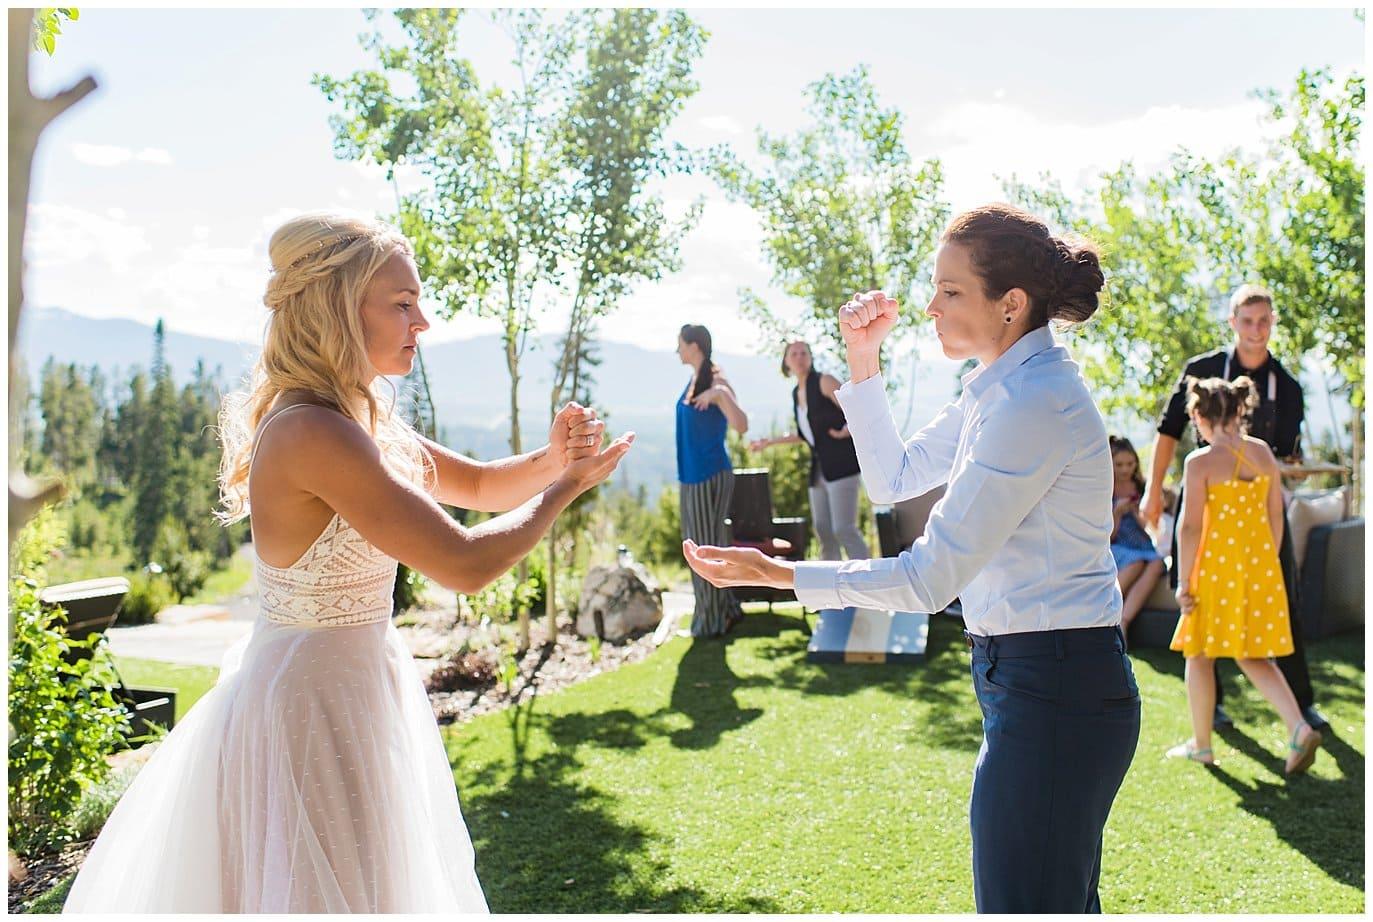 rock paper scissor for yard games at wedding photo